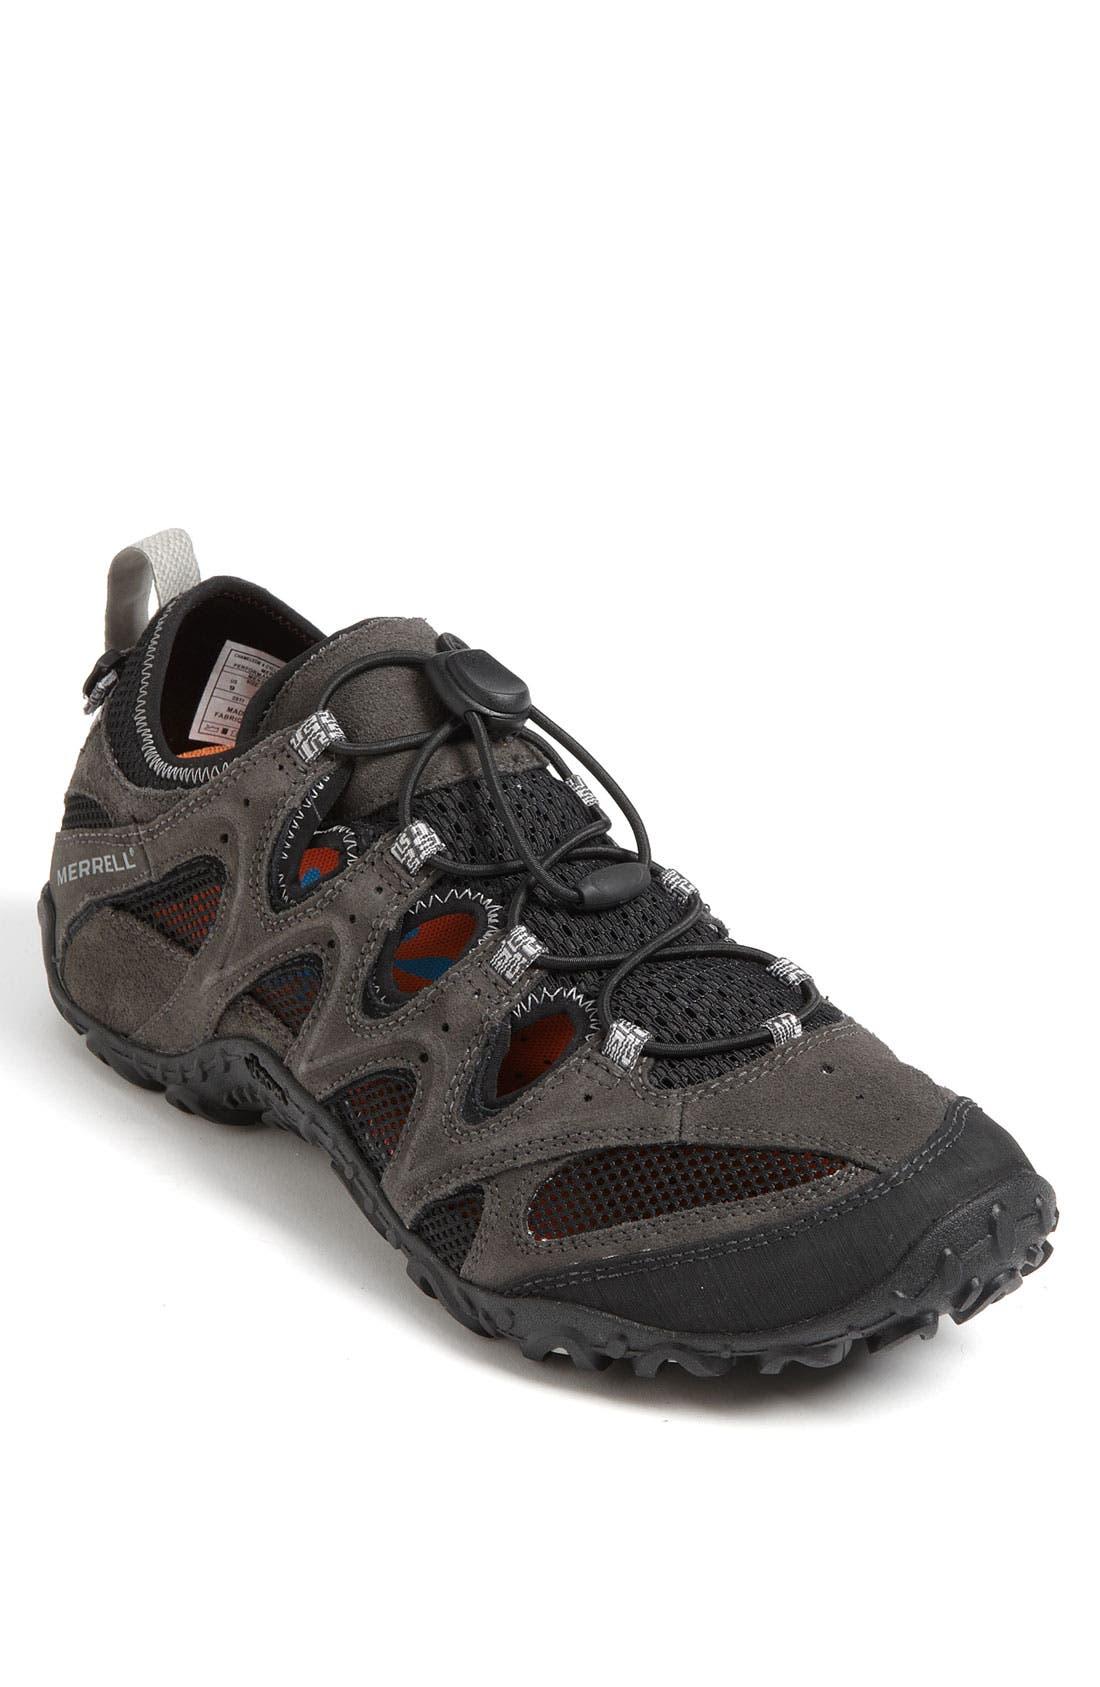 Main Image - Merrell 'Chameleon Cyclone' Hiking Shoe (Men)